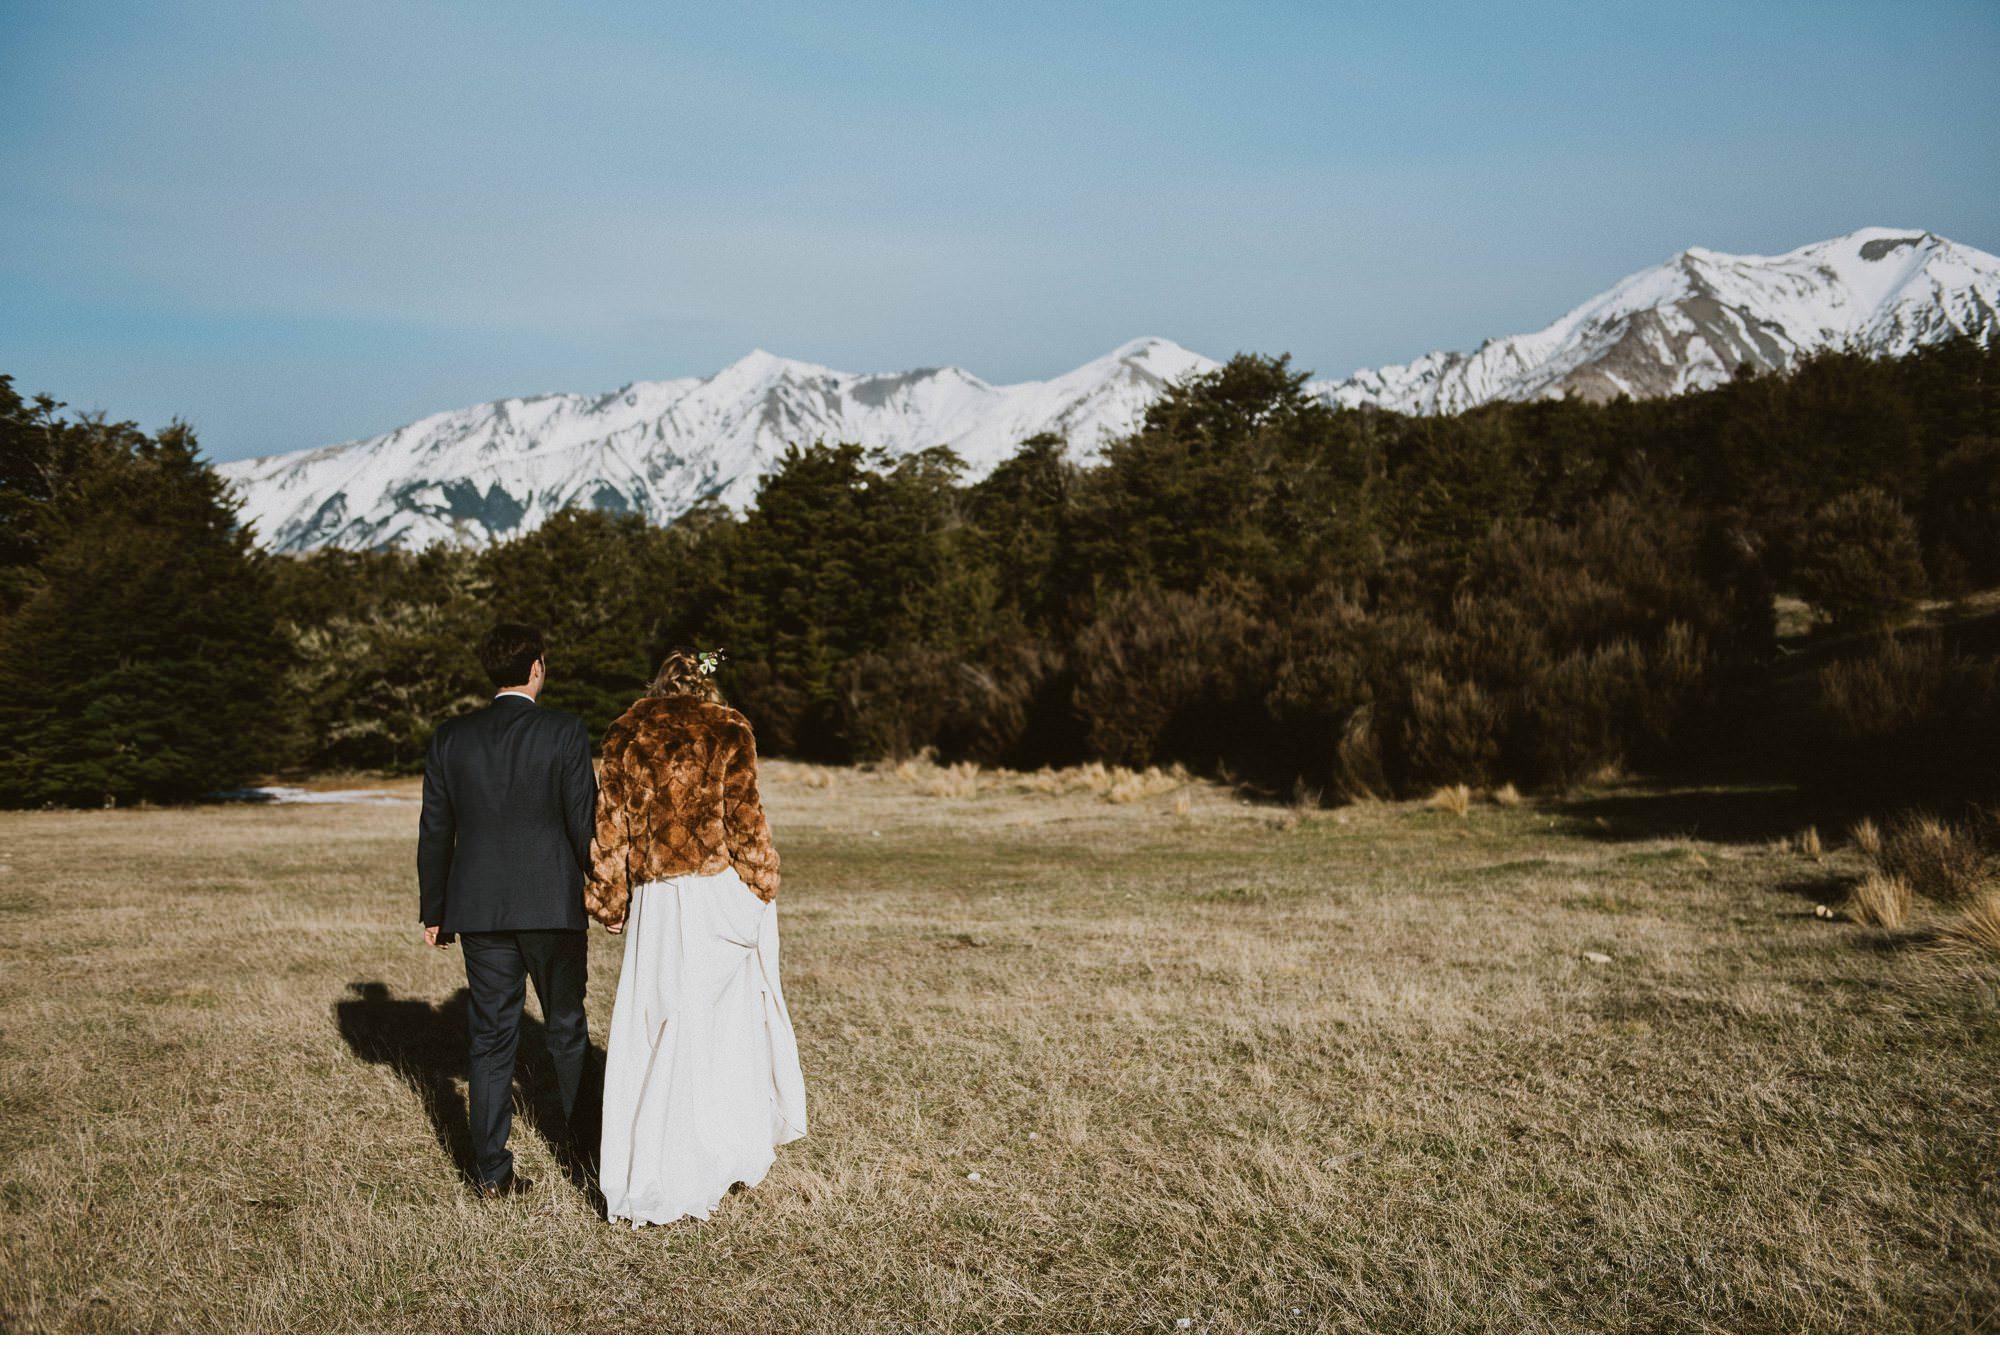 Castle-Hill-Lodge-Wedding-026.jpg